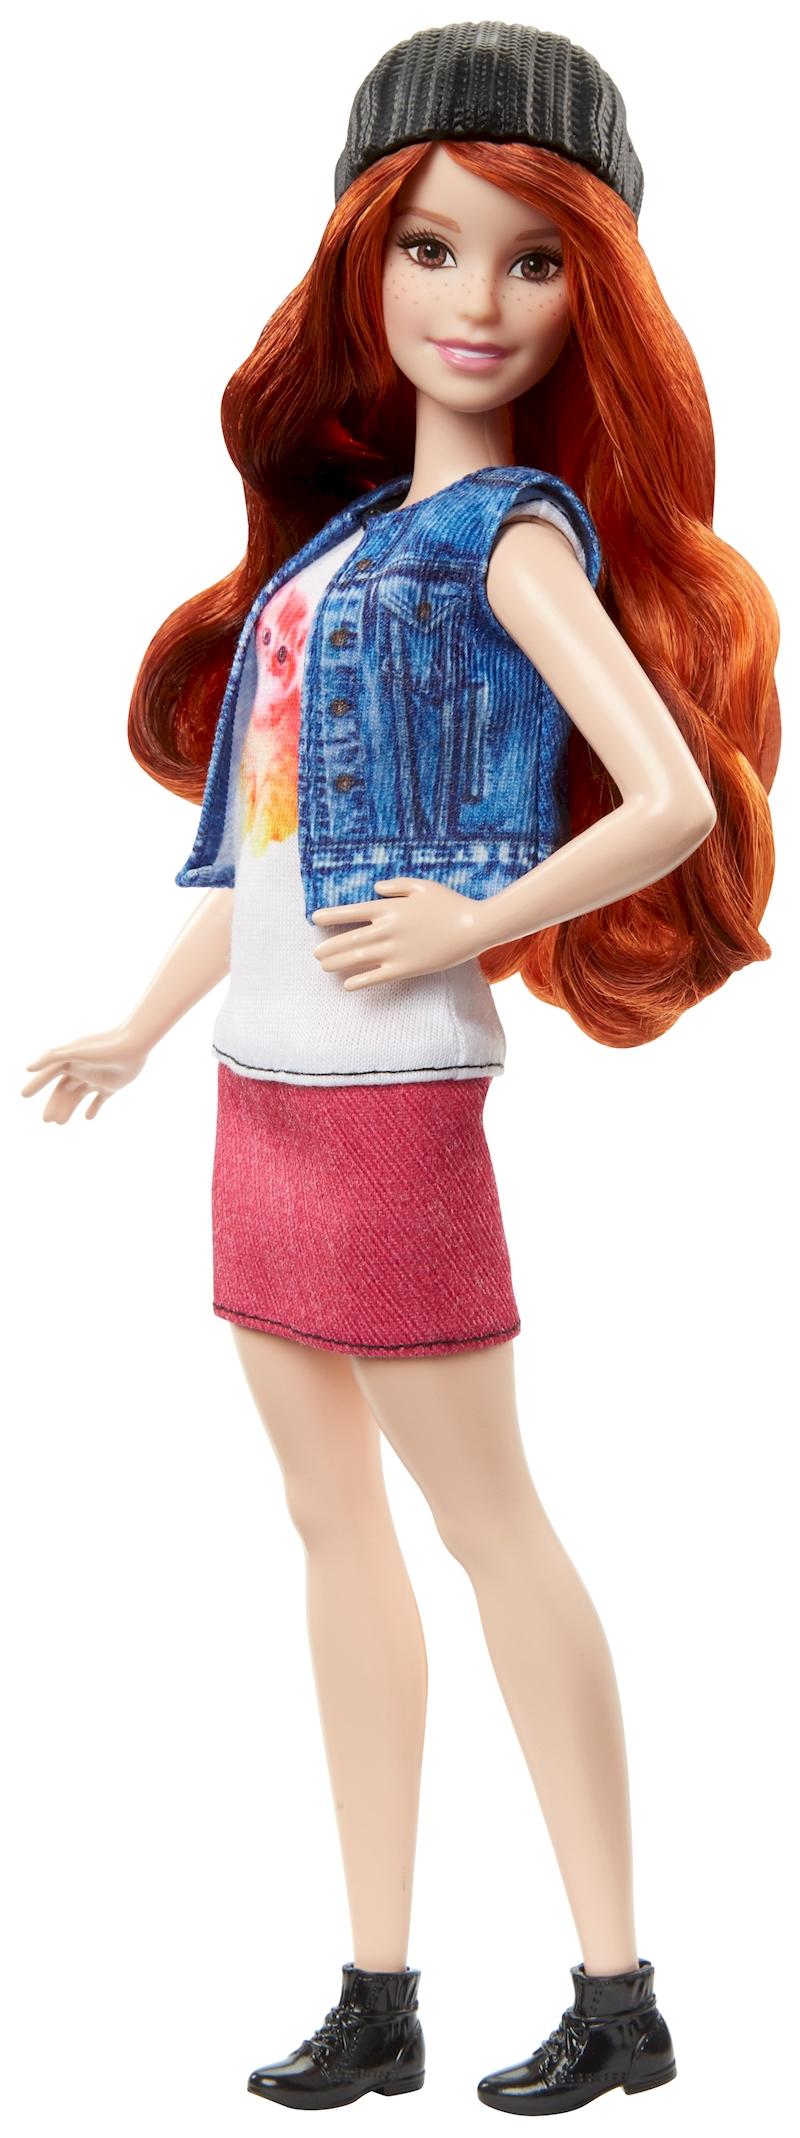 barbie denim vest, barbie 3 set, barbie clothes, barbie white shirt, barbie vest, jeans for barbie, barbie jacket, barbie clothes handmade.